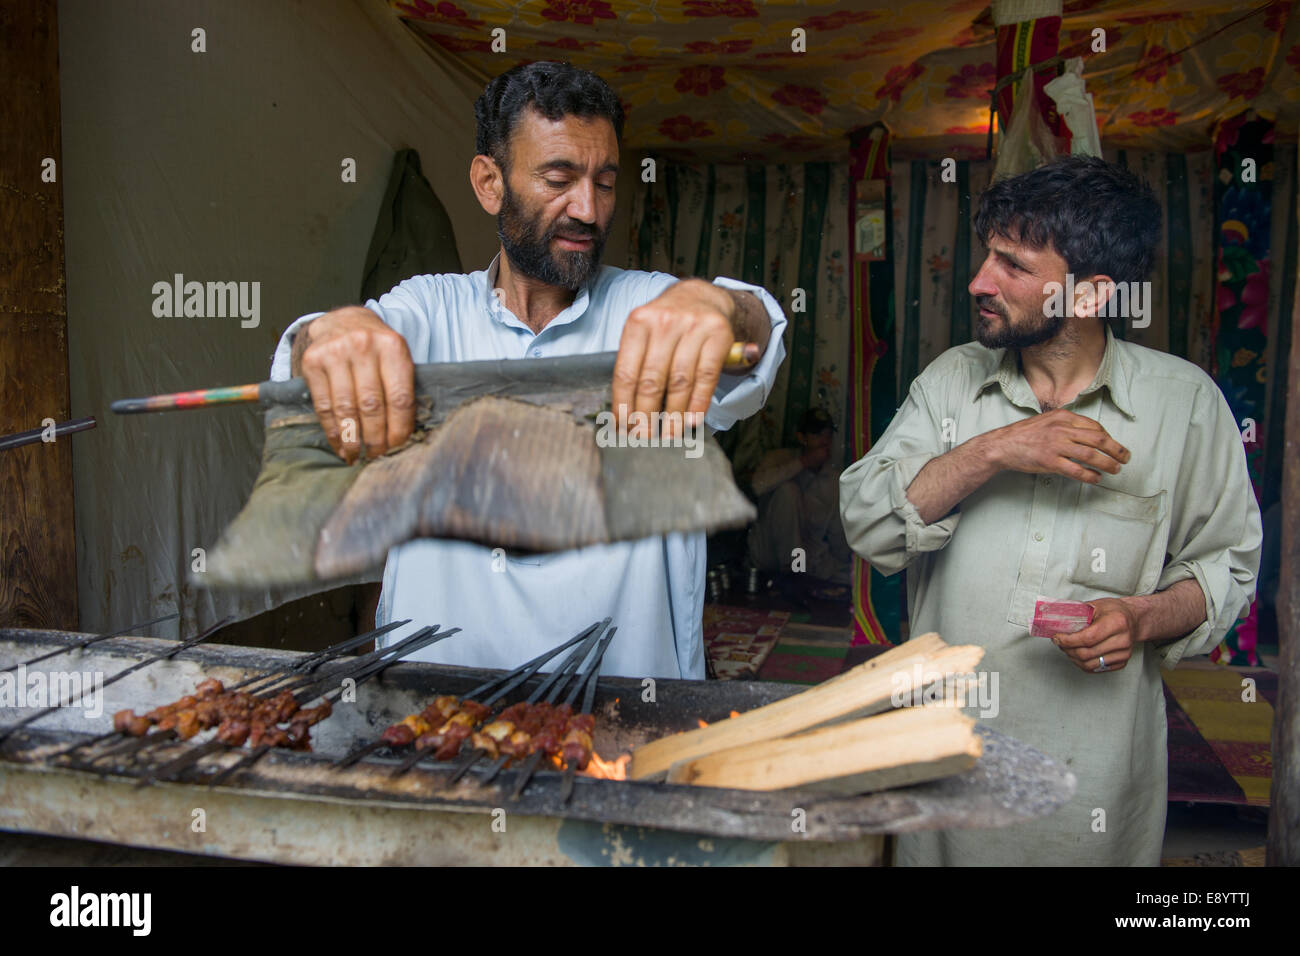 Small shop selling kebabs, Rumbur Valley, Chitral, Khyber-Pakhtunkhwa, Pakistan - Stock Image